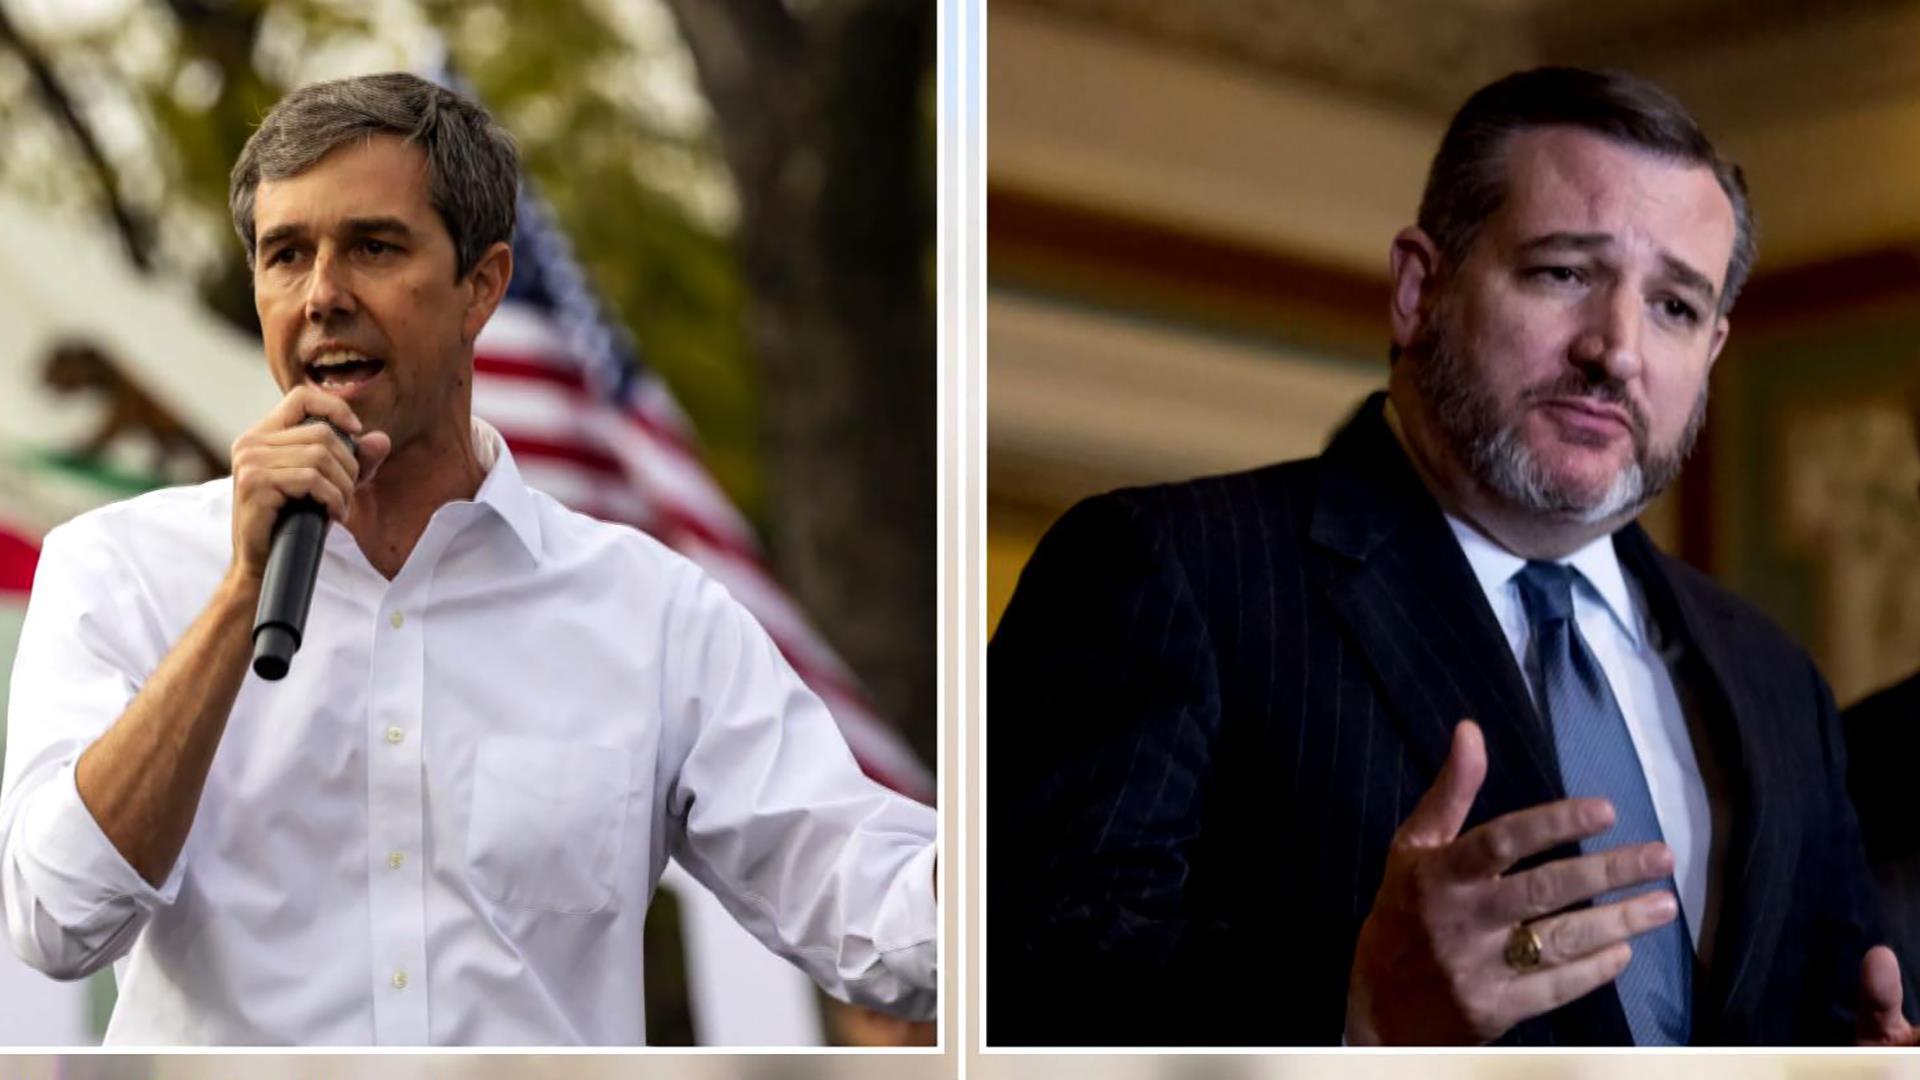 Democrats target Arizona, Texas for 2020 growth